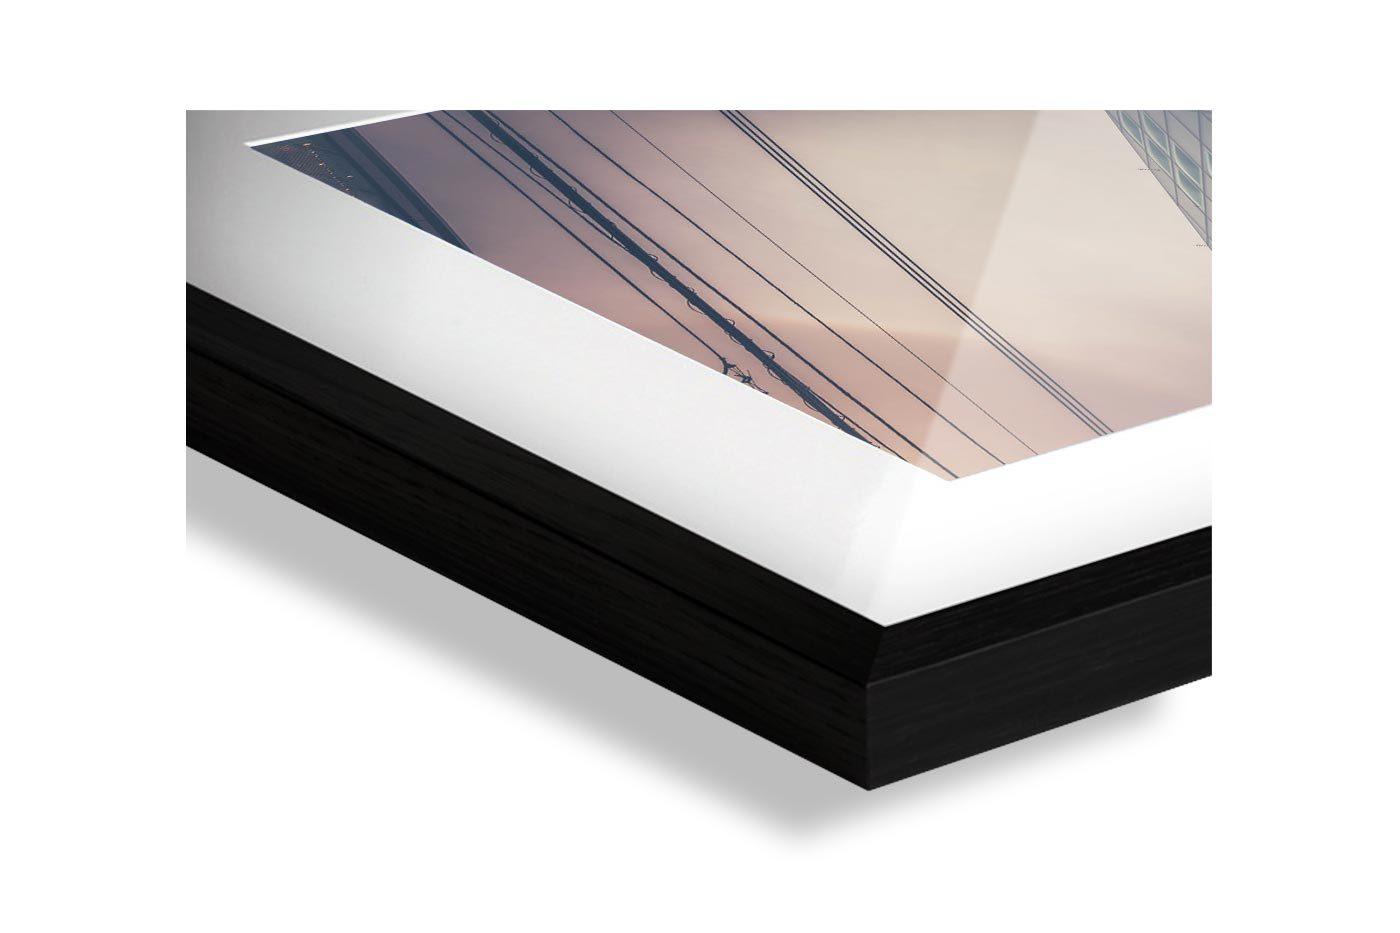 Profil cadre galerie Hype